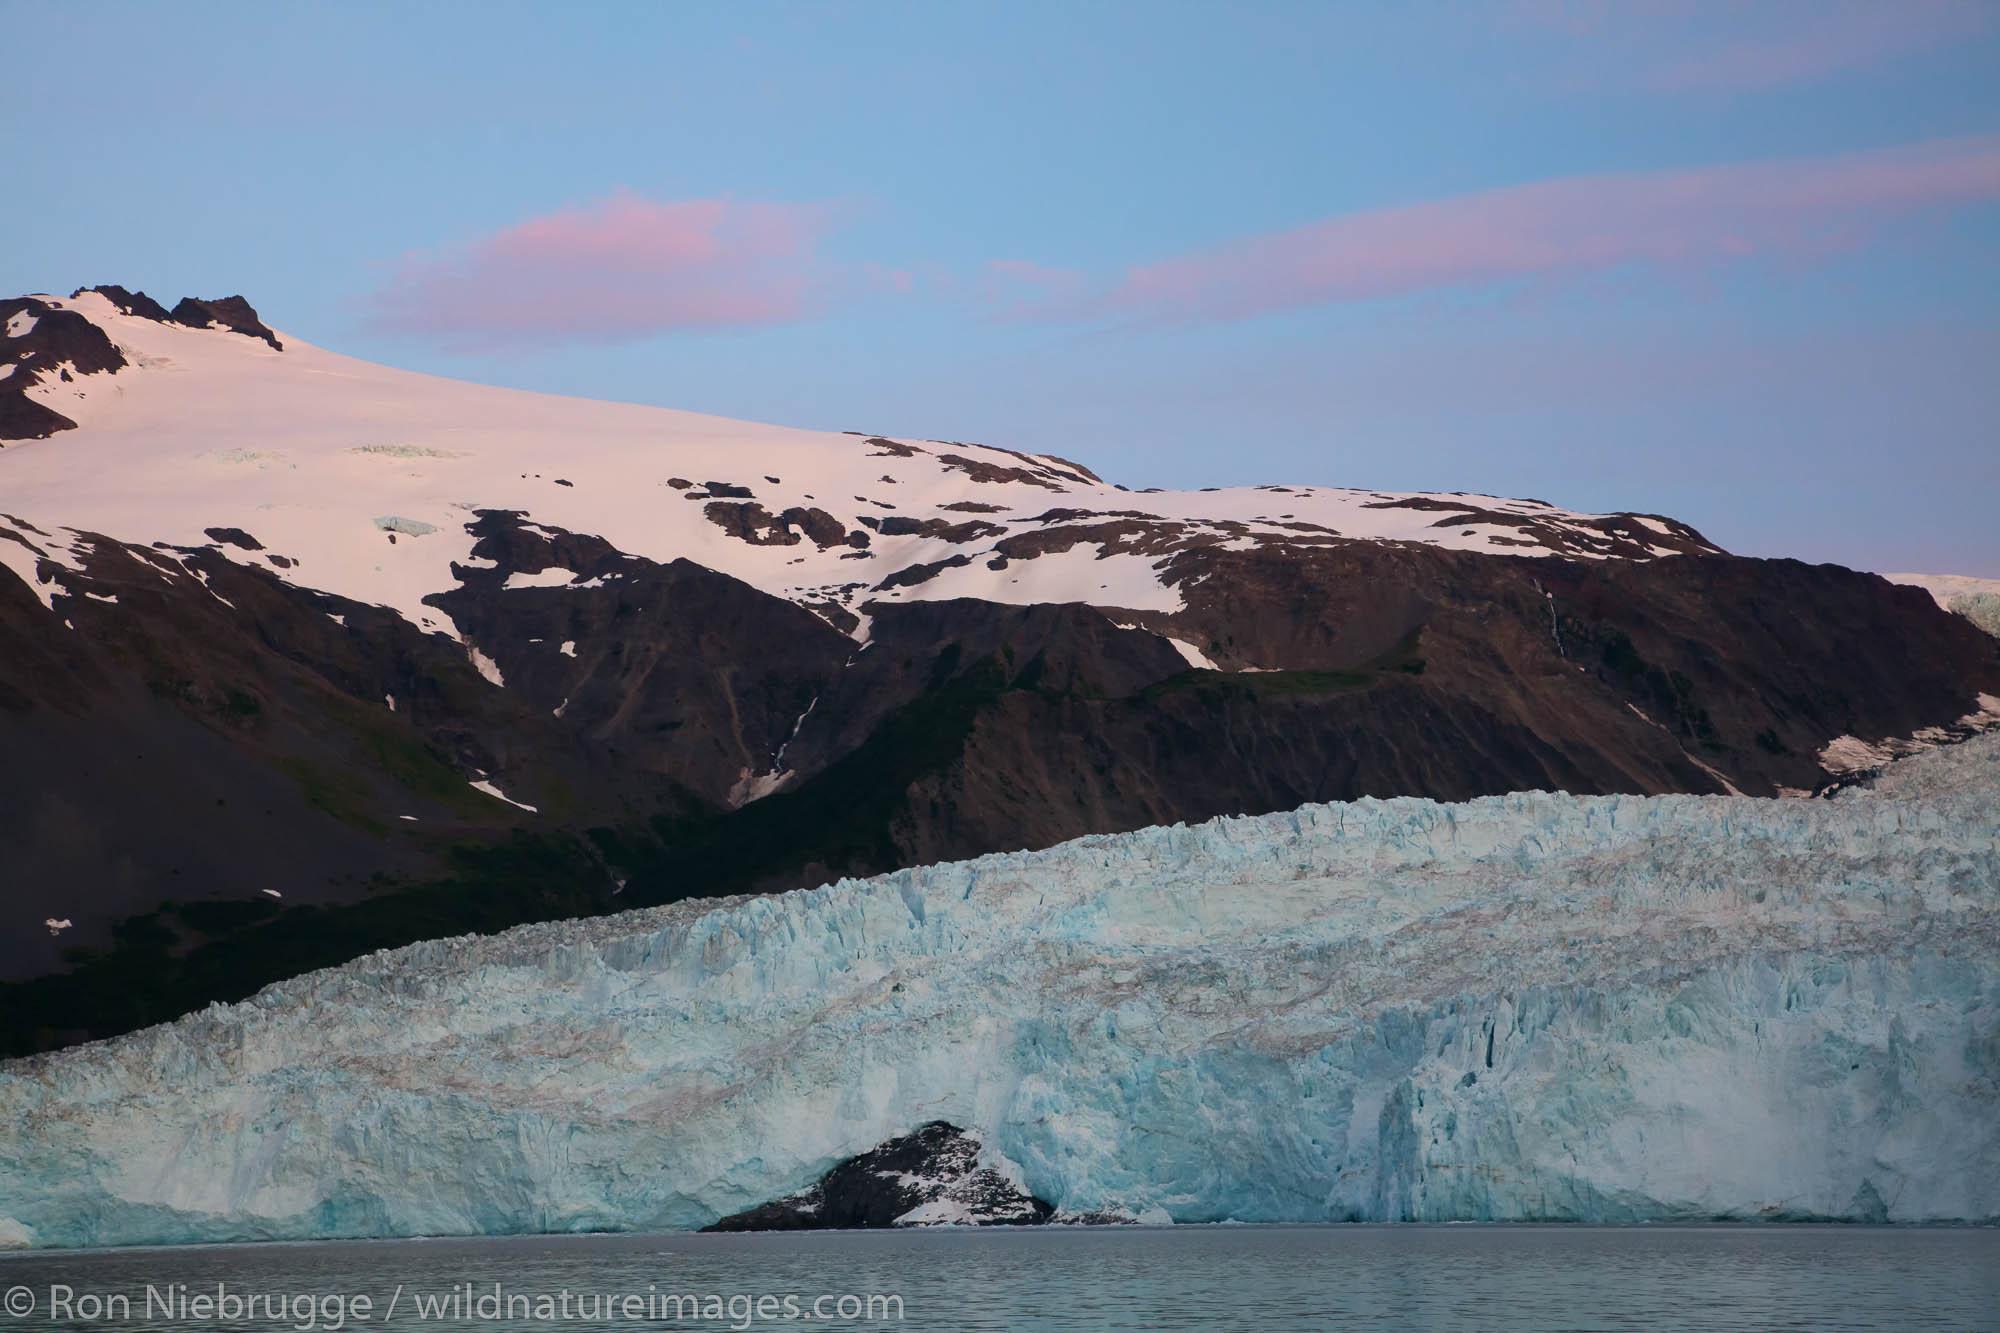 Kenai Fjords National Park, Alaska, Aialik Glacier, photo